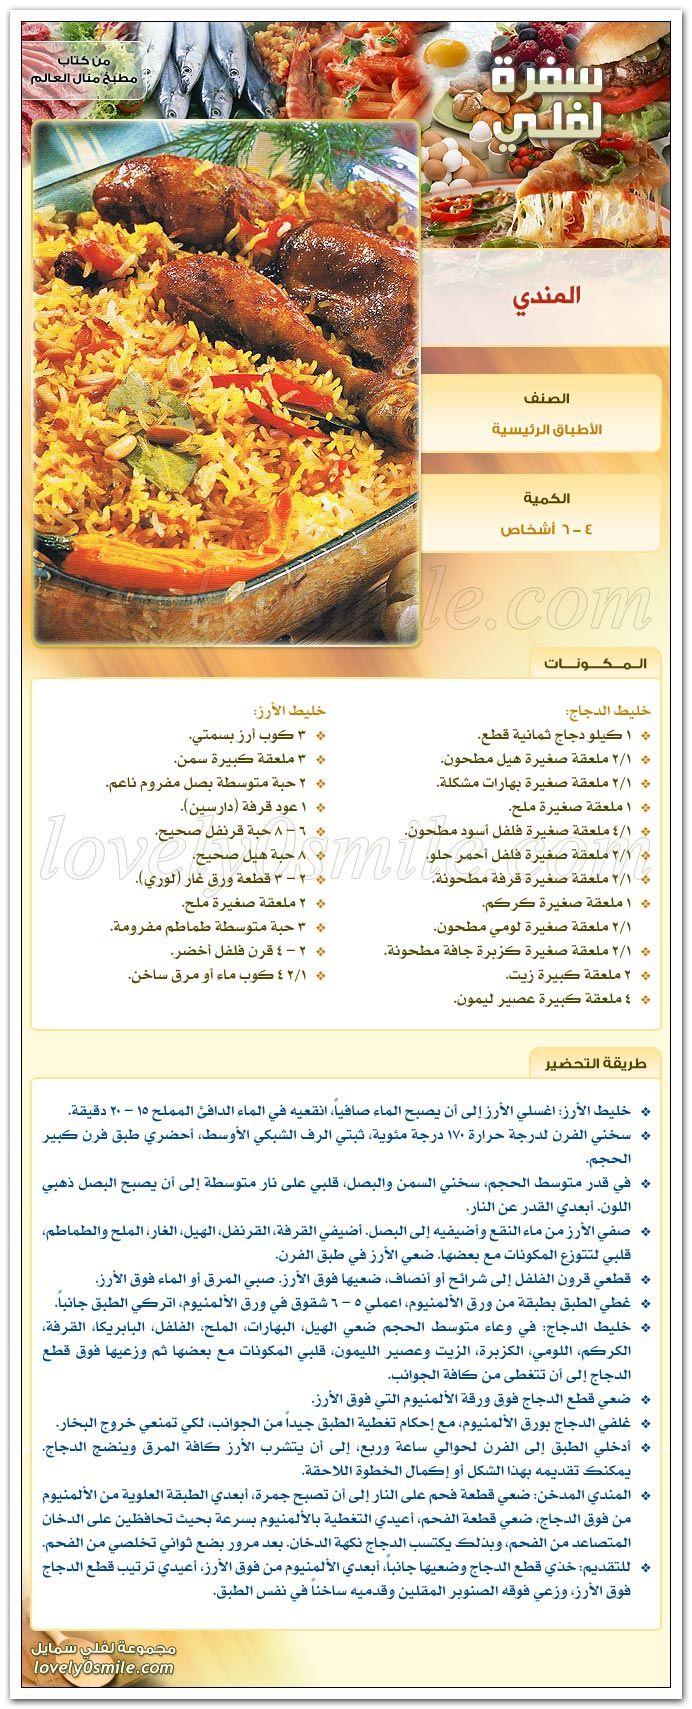 المندي Cookout Food Egyptian Food Food Recipies